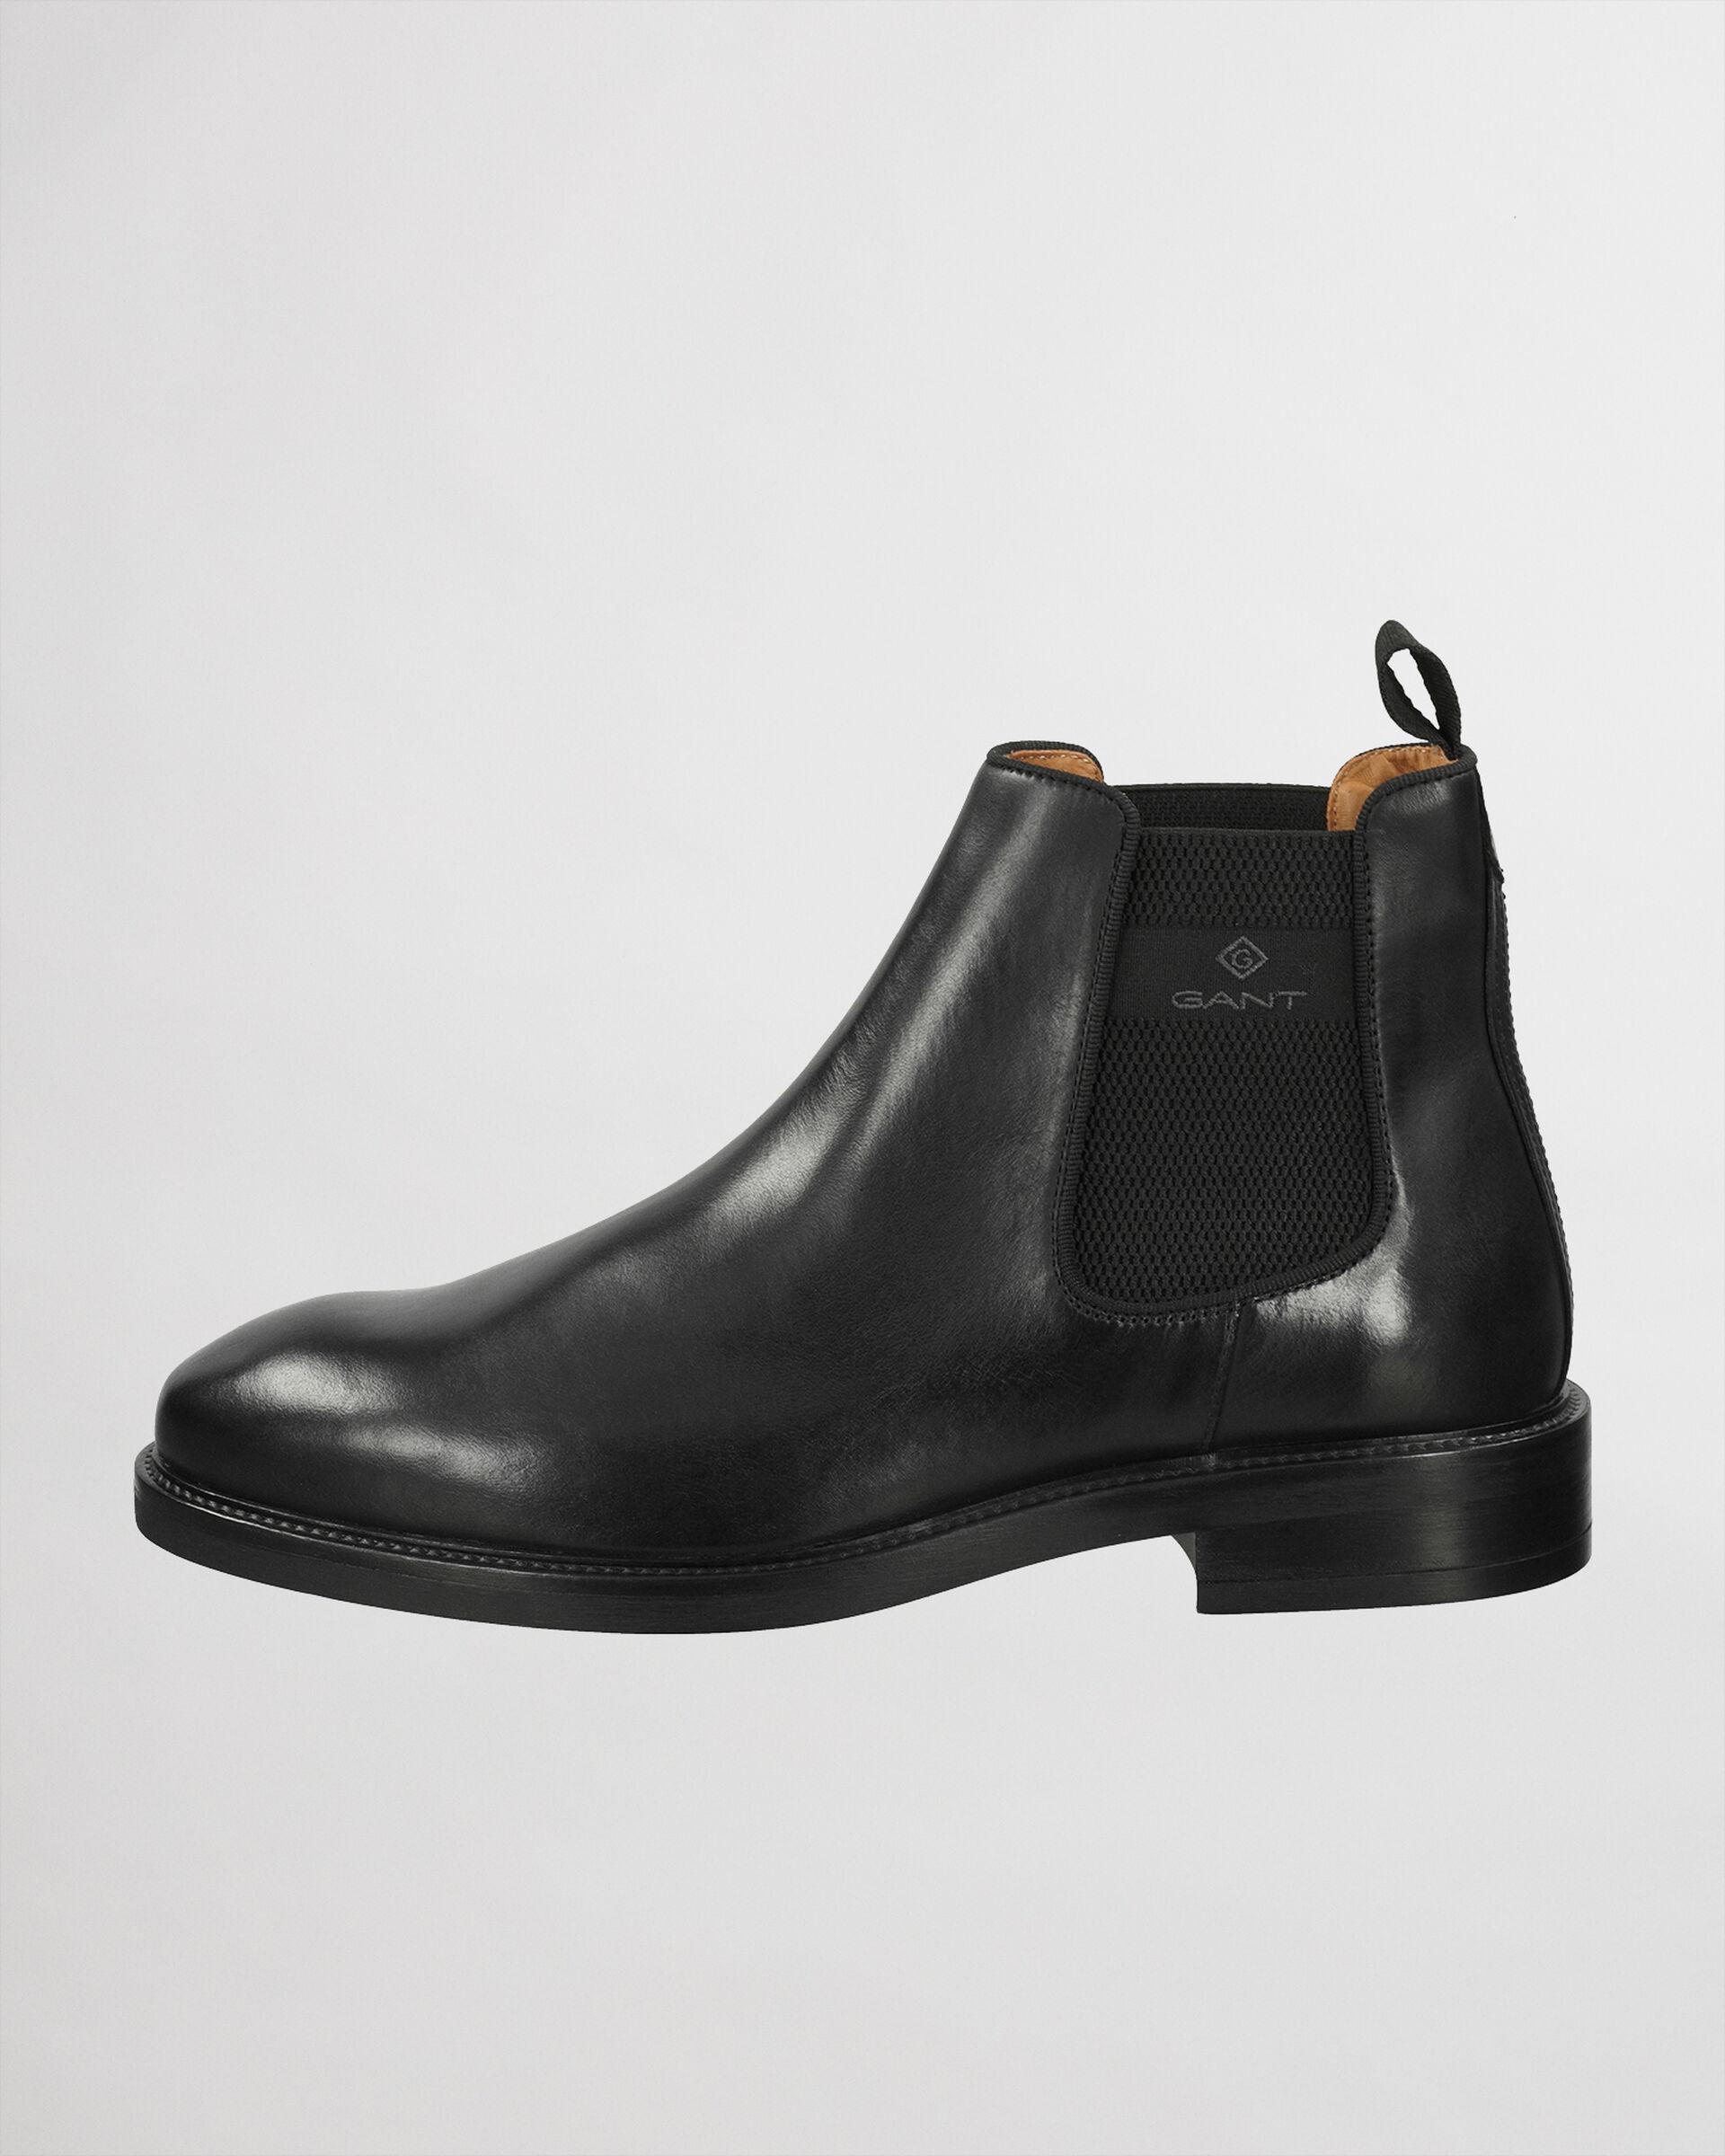 Gant Chelsea Læderstøvler, Sort, 45